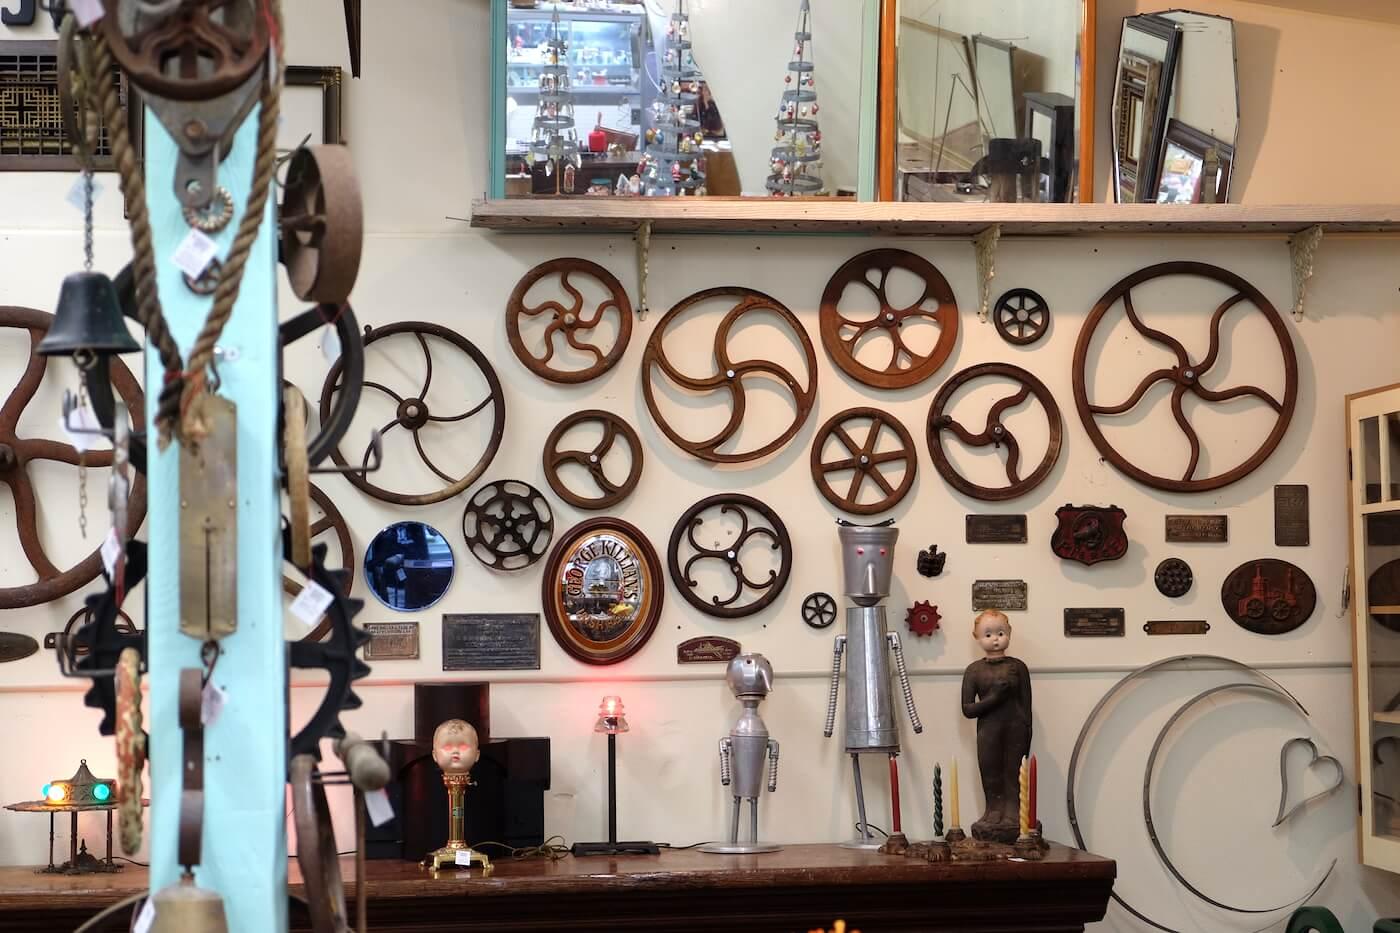 Steampunk Electronic Art at Spencer's Ferndale Vintage - Historic Ferndale CA.jpeg